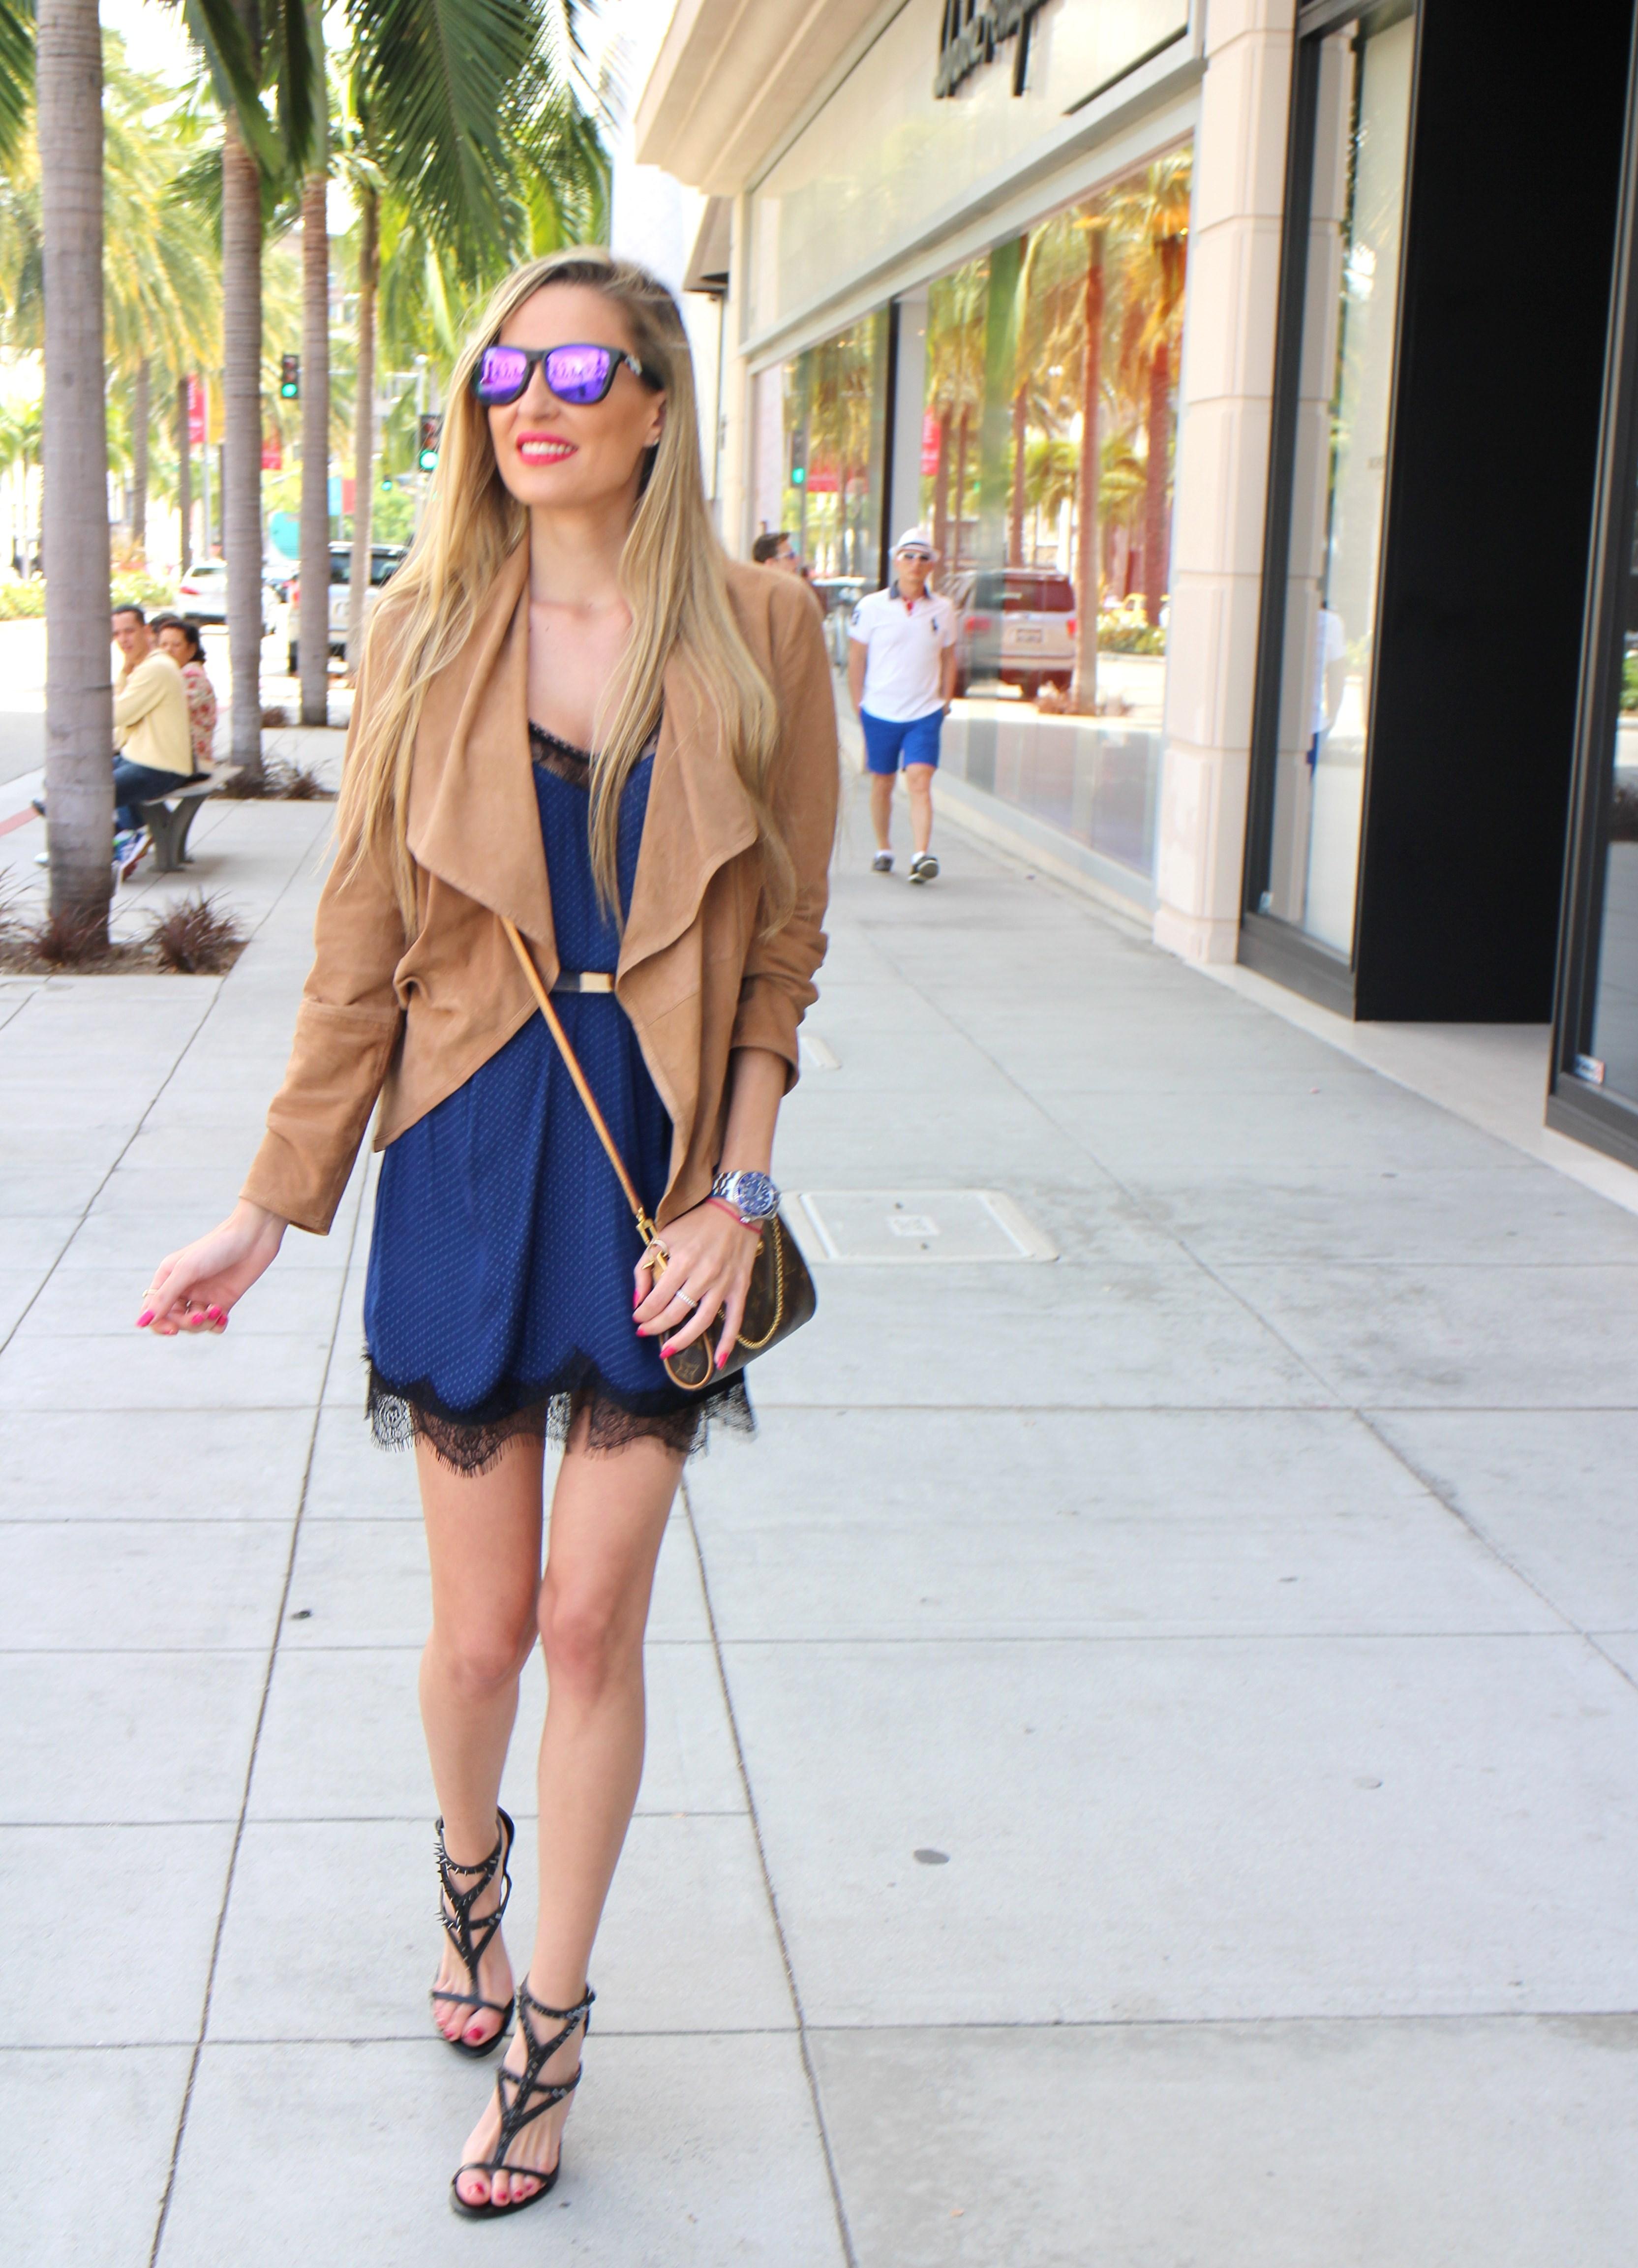 Rodeo_Drive_Los_Angeles_California_Shopping_Lara_Martin_Gilarranz_Bymyheels (7)